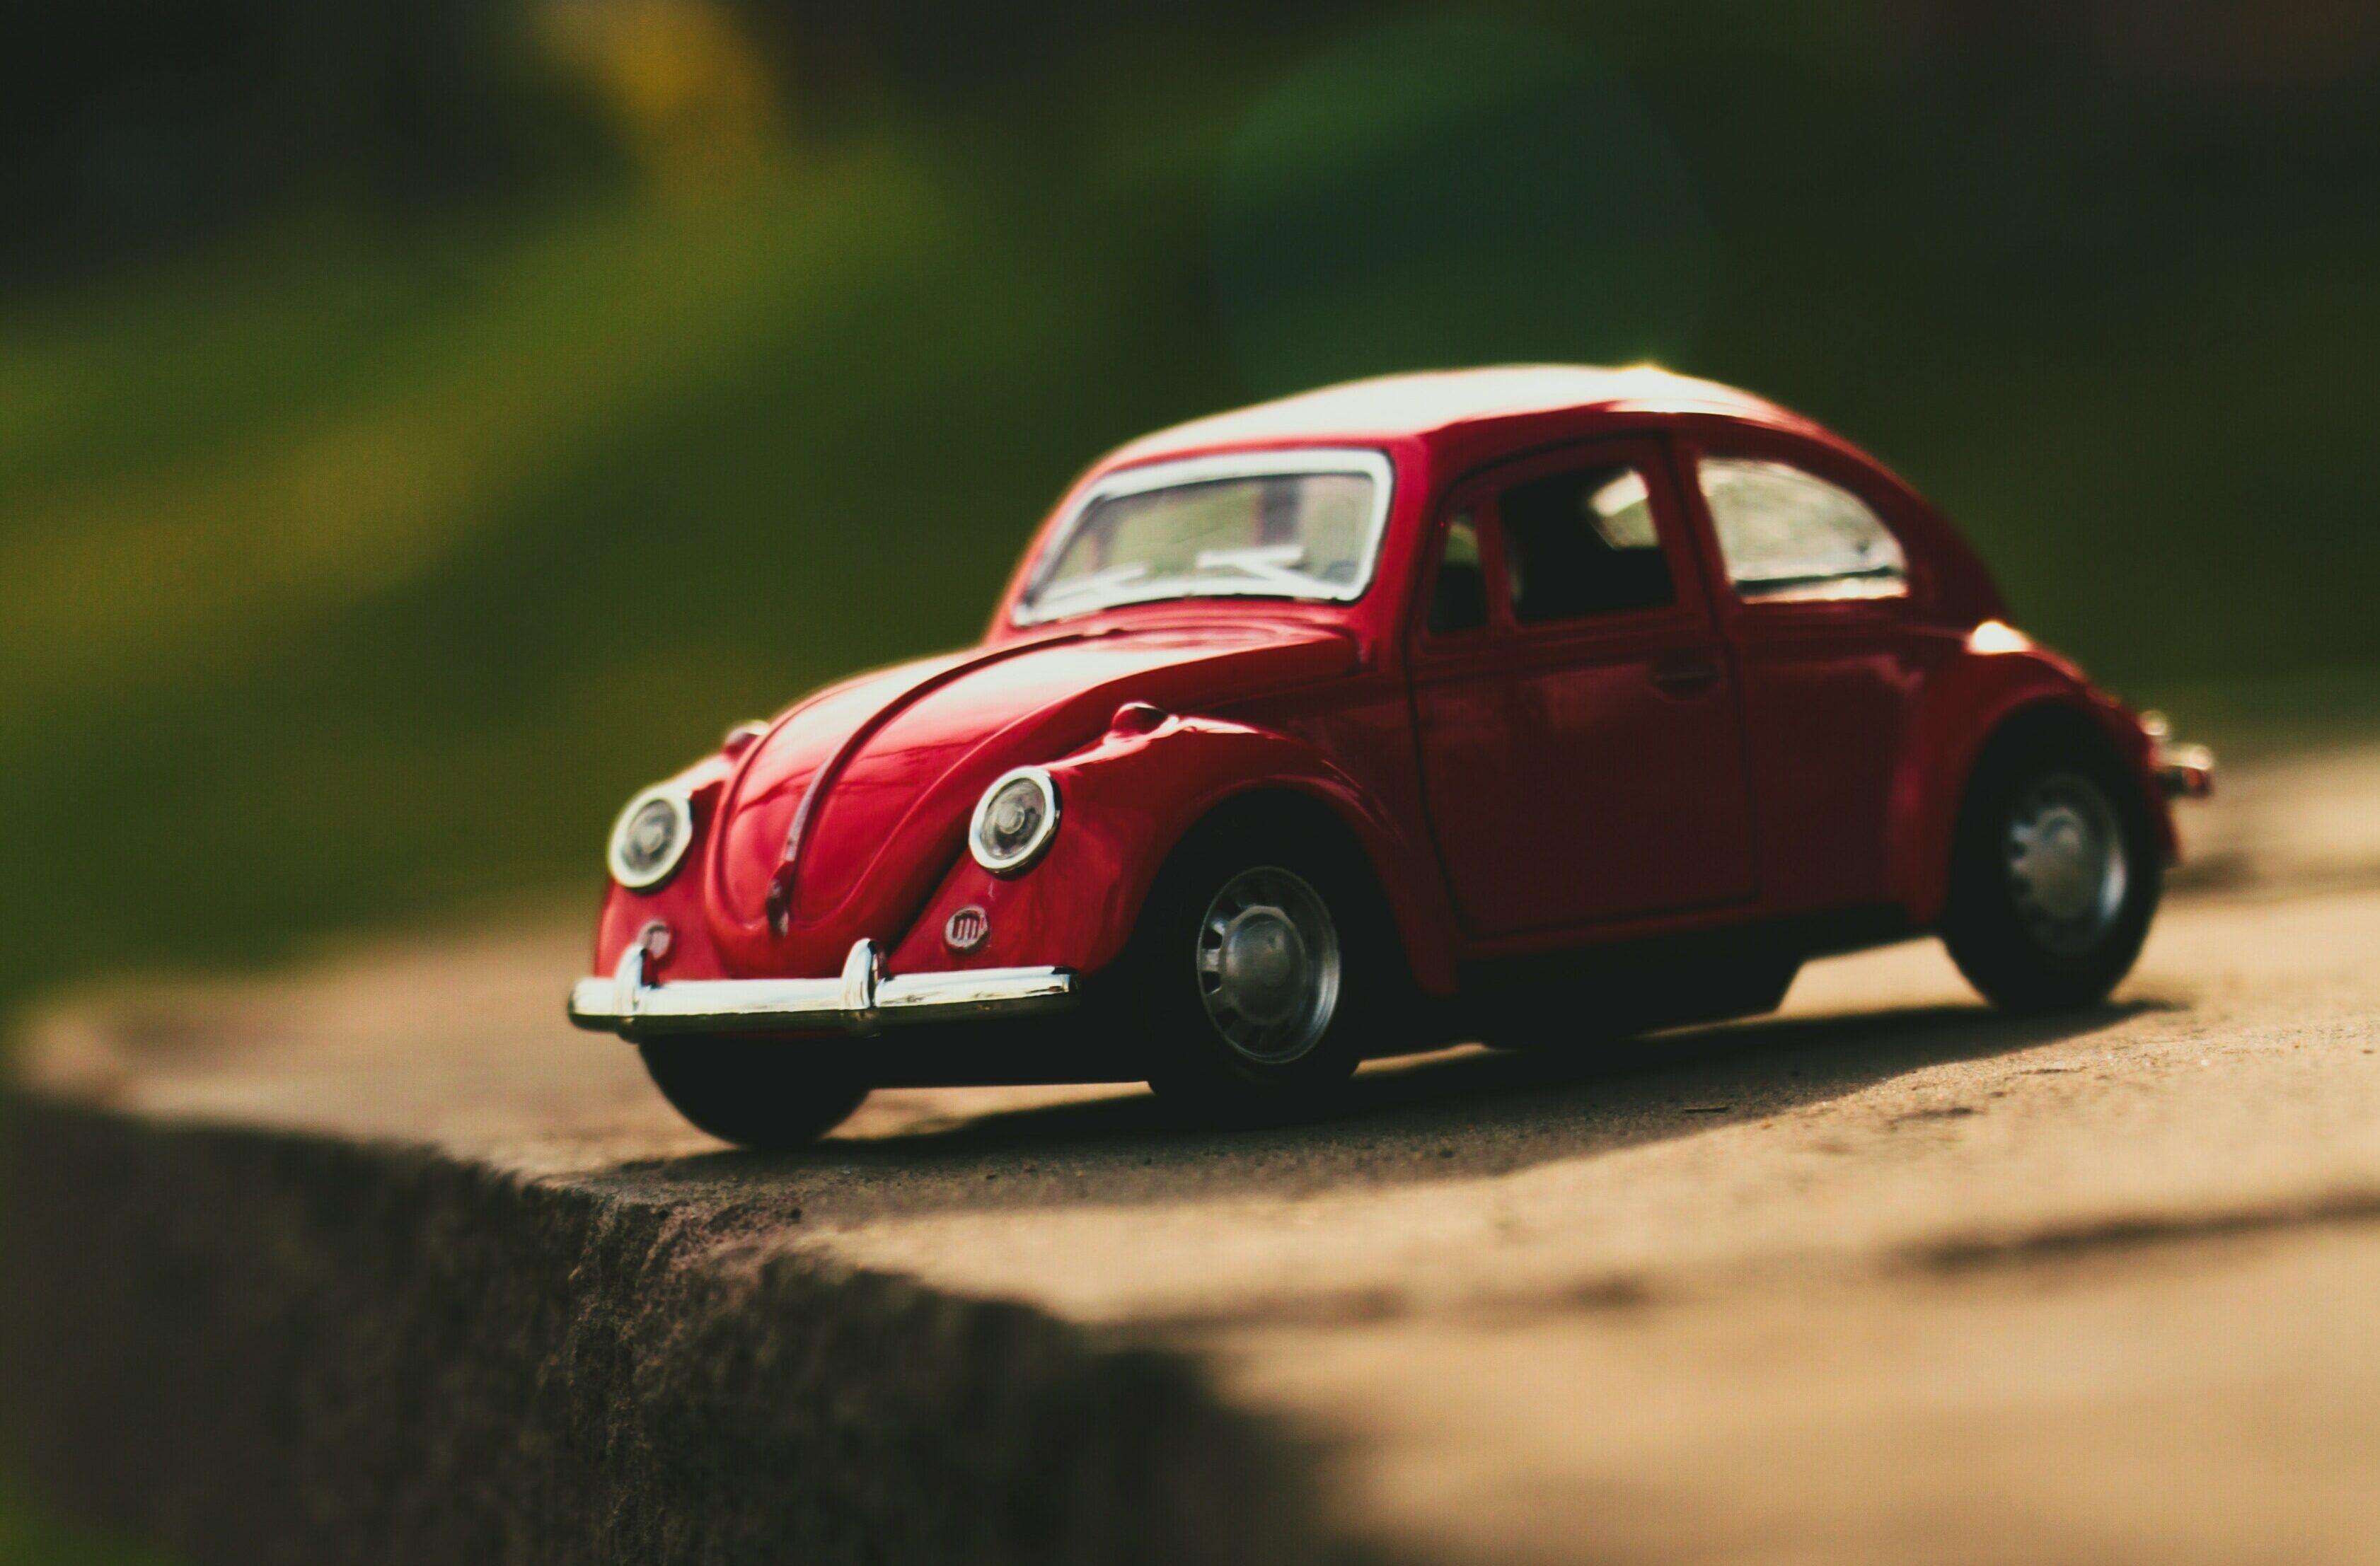 Red VW Beetle Car Model